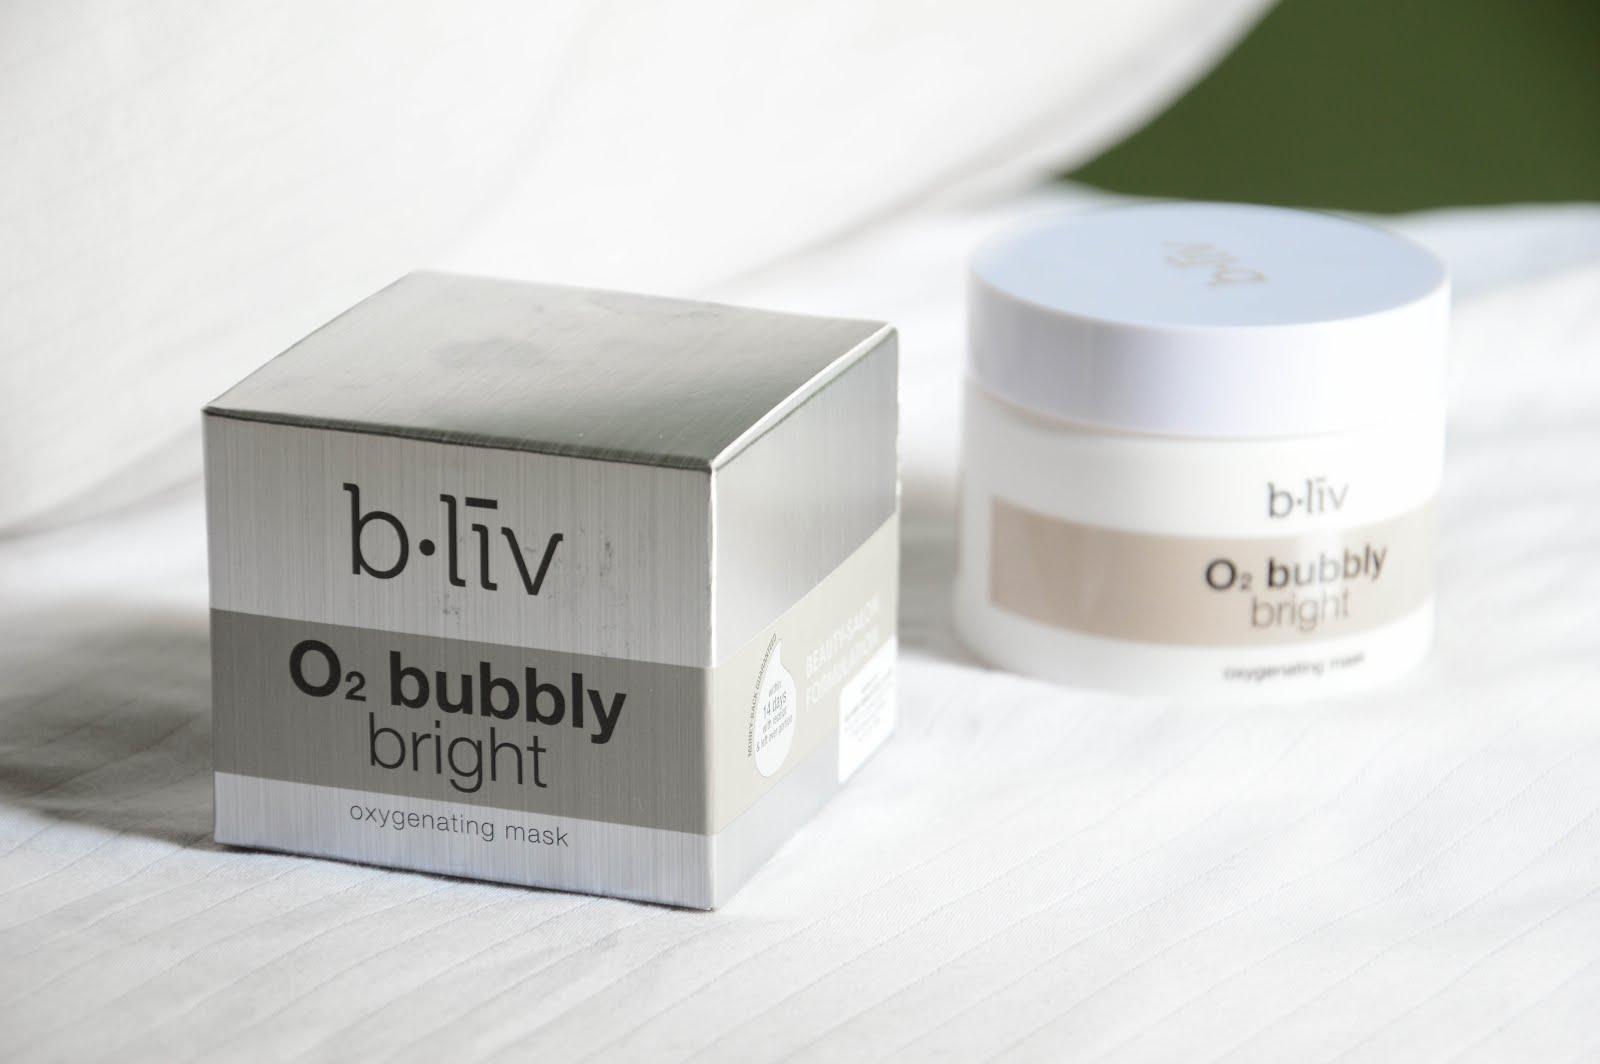 bliv o2 bubbly bright review